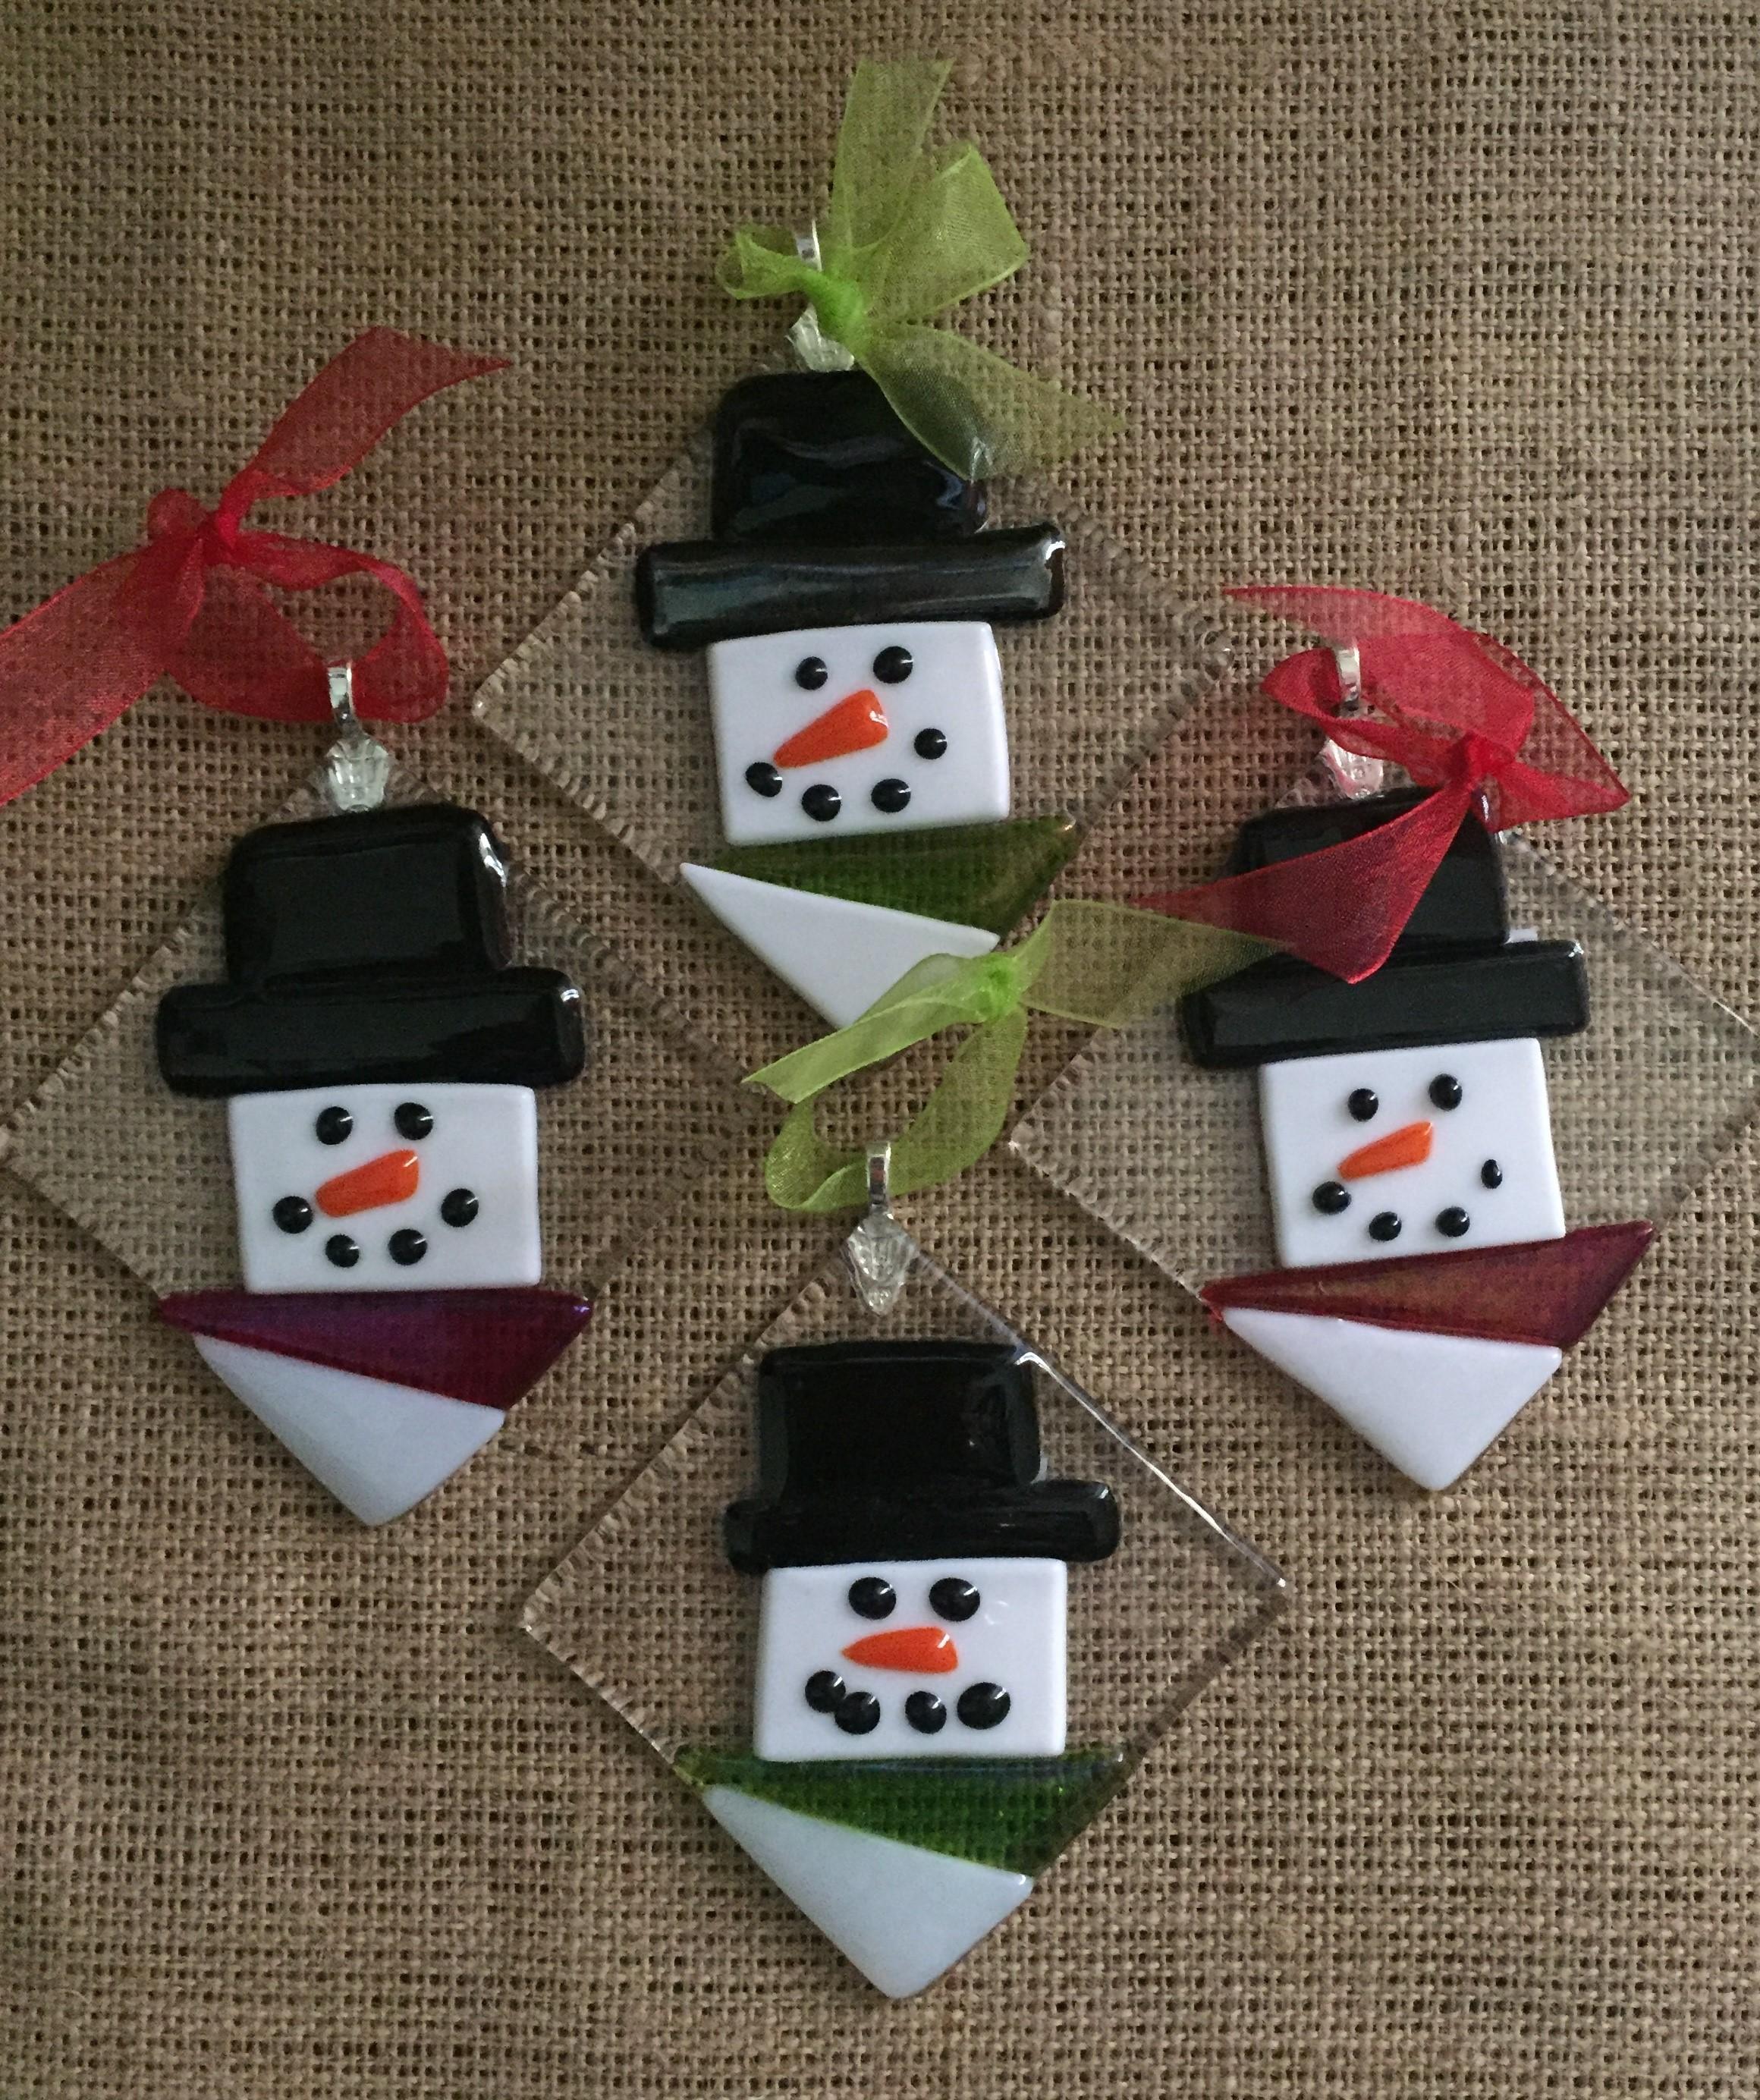 2018 Snowman Ornament.jpg